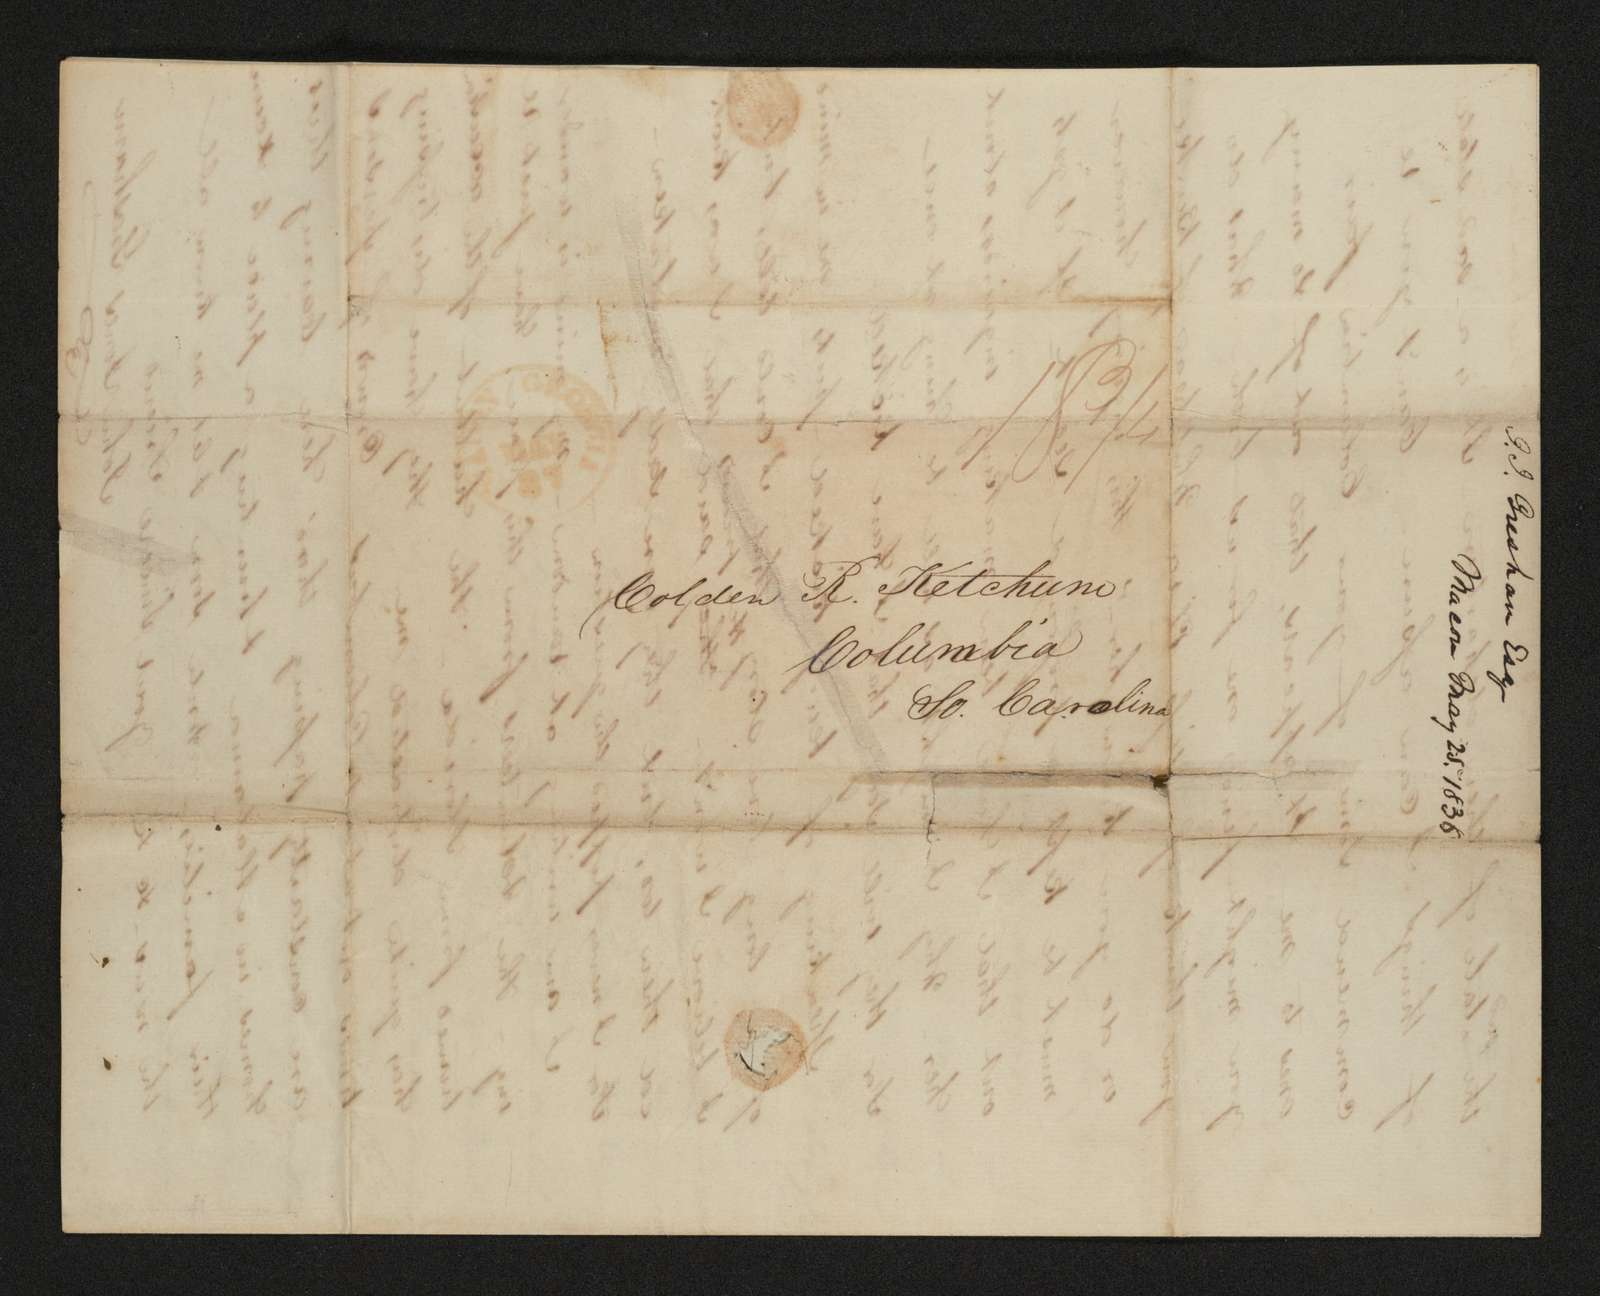 Lewis H. Machen Family Papers: Gresham Family Correspondence, 1834-1925; 1834-1845